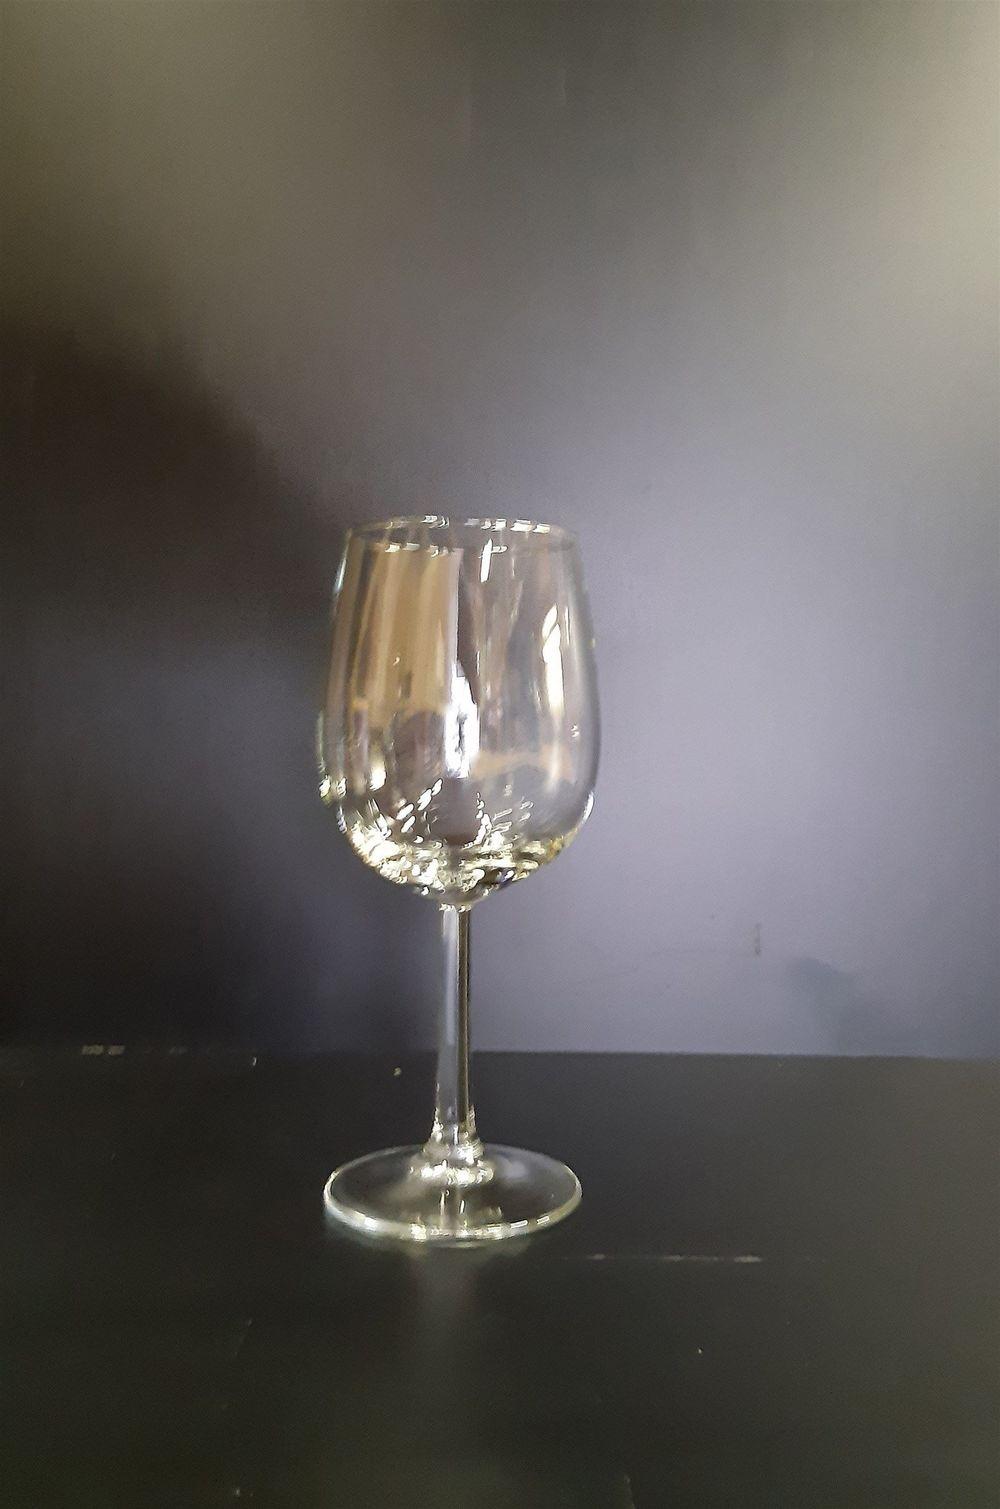 Weisswein Glas 0.23 l DOC 16 cm hoch - Fr. 0.70 pro / St.